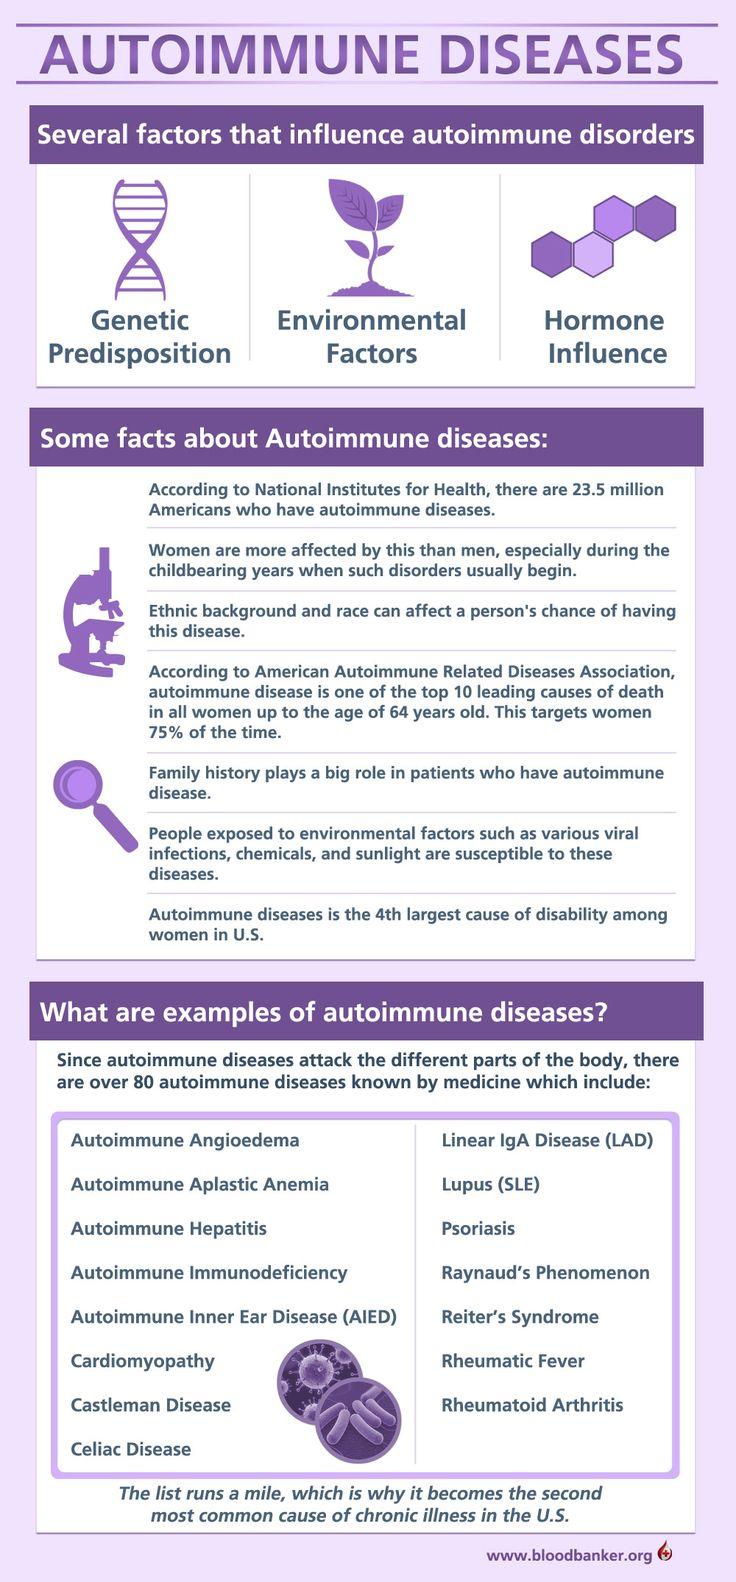 http://bloodbanker.com/plasma/wp-content/uploads/2013/01/Autoimmune-Diseases-Infographics-2.jpg